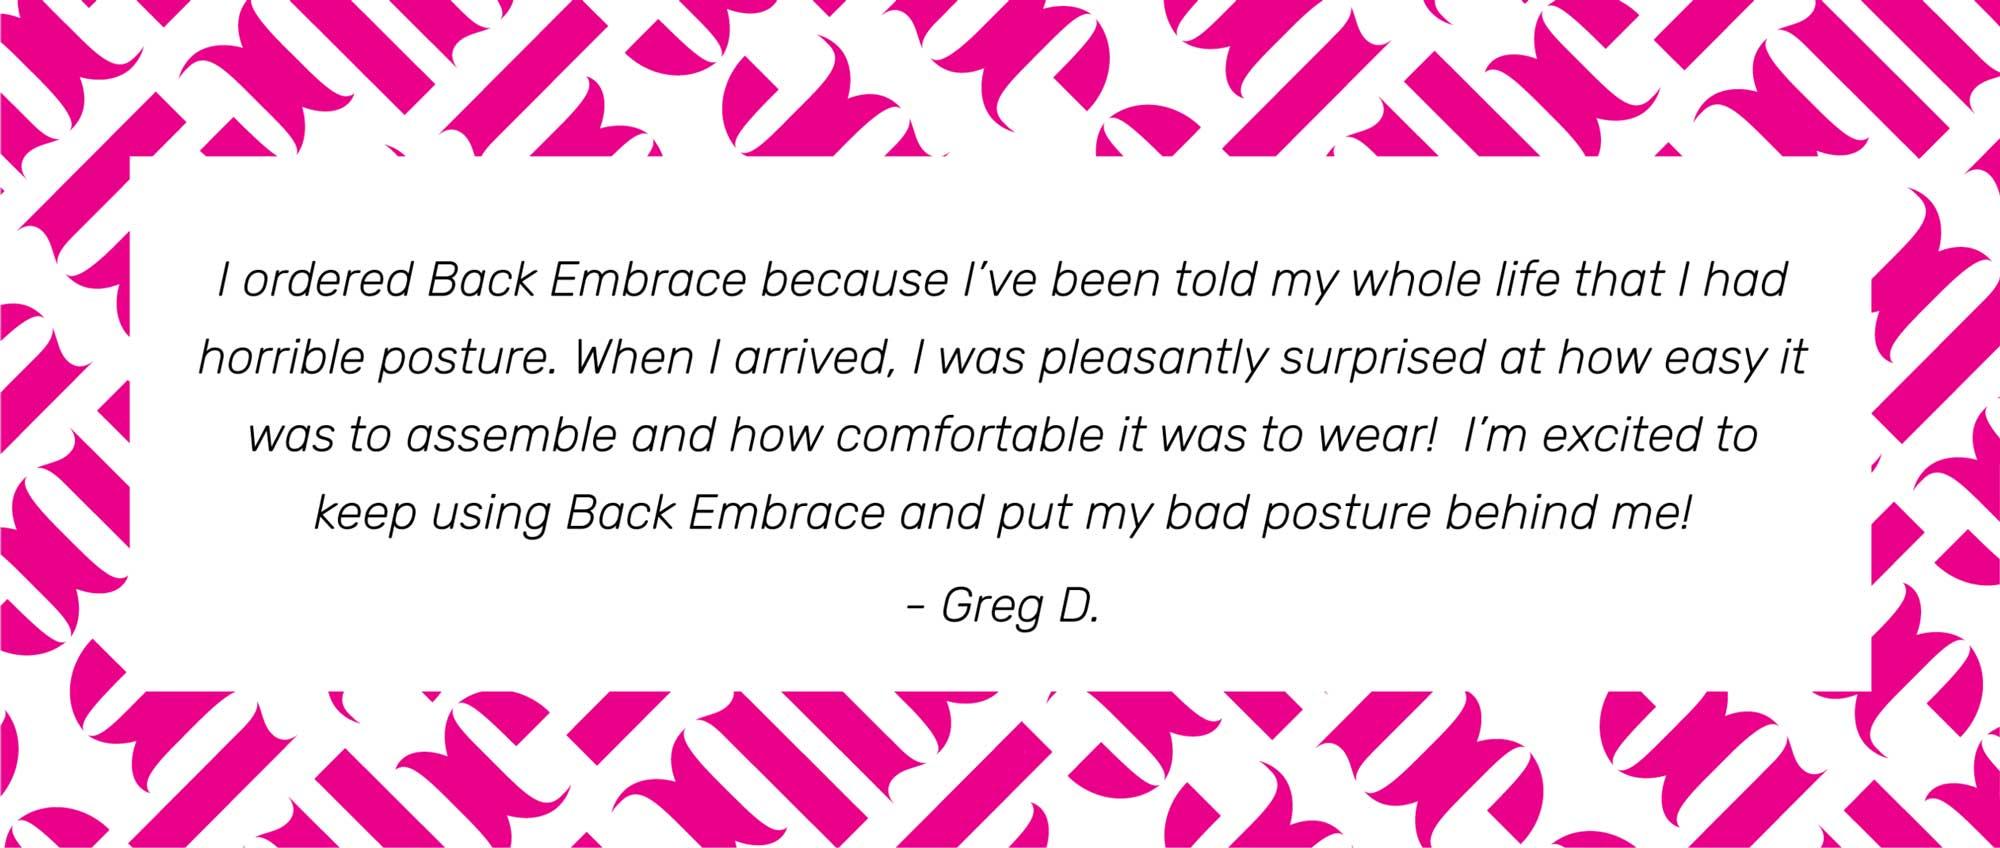 back-embrace-testimonial-11